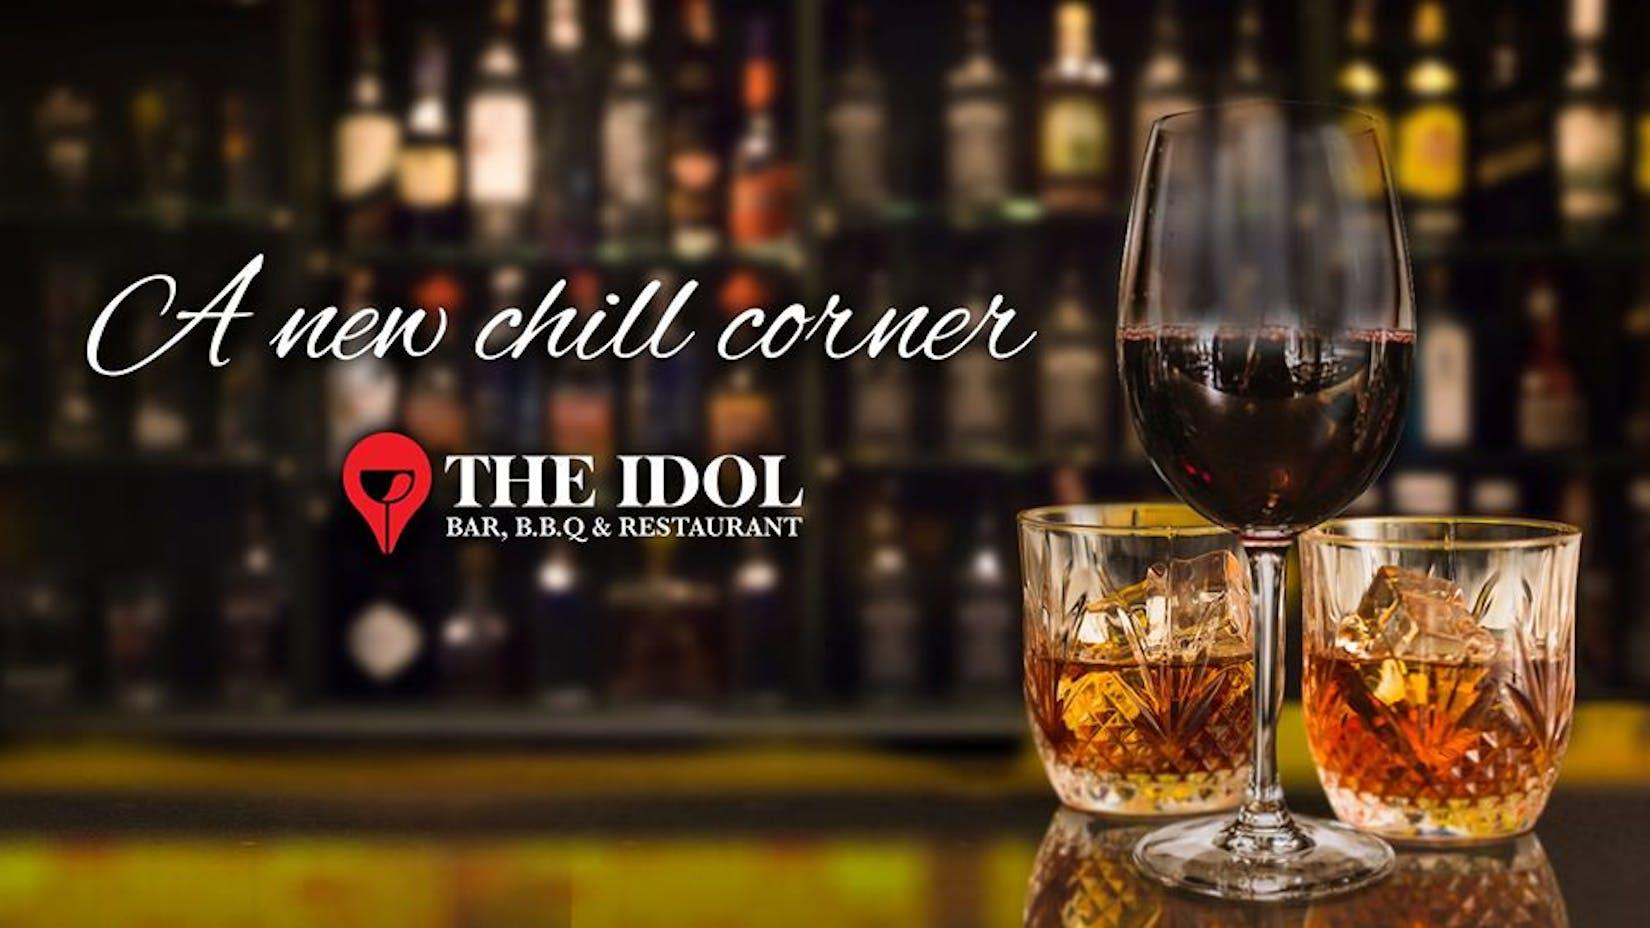 The Idol Bar & B.B.Q Restaurant | yathar